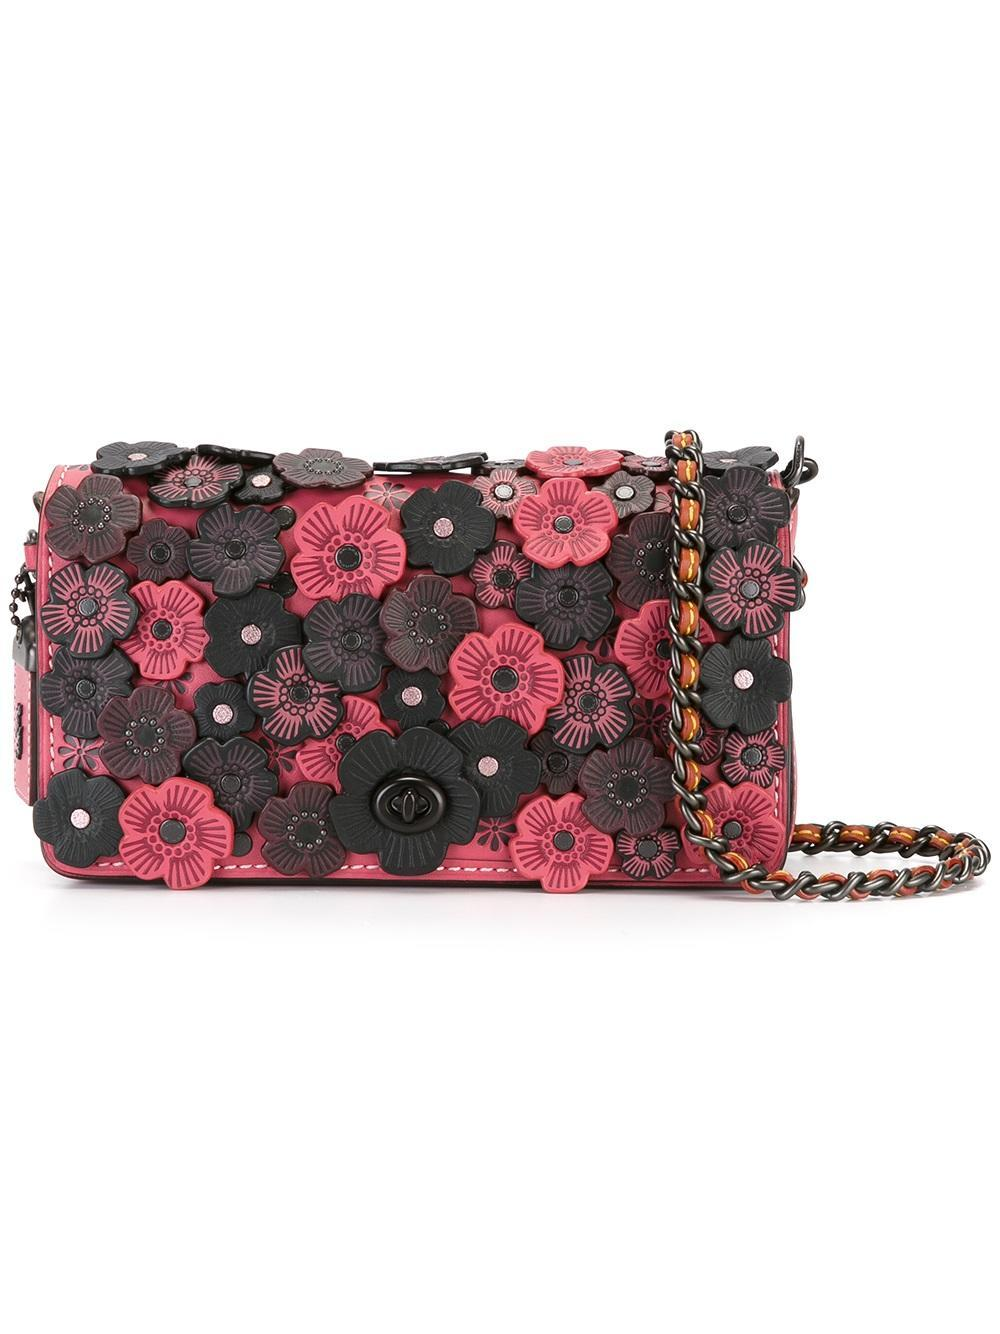 Coach flower purse coach flower purse lyst coach flower embellished crossbody bag in pink mightylinksfo